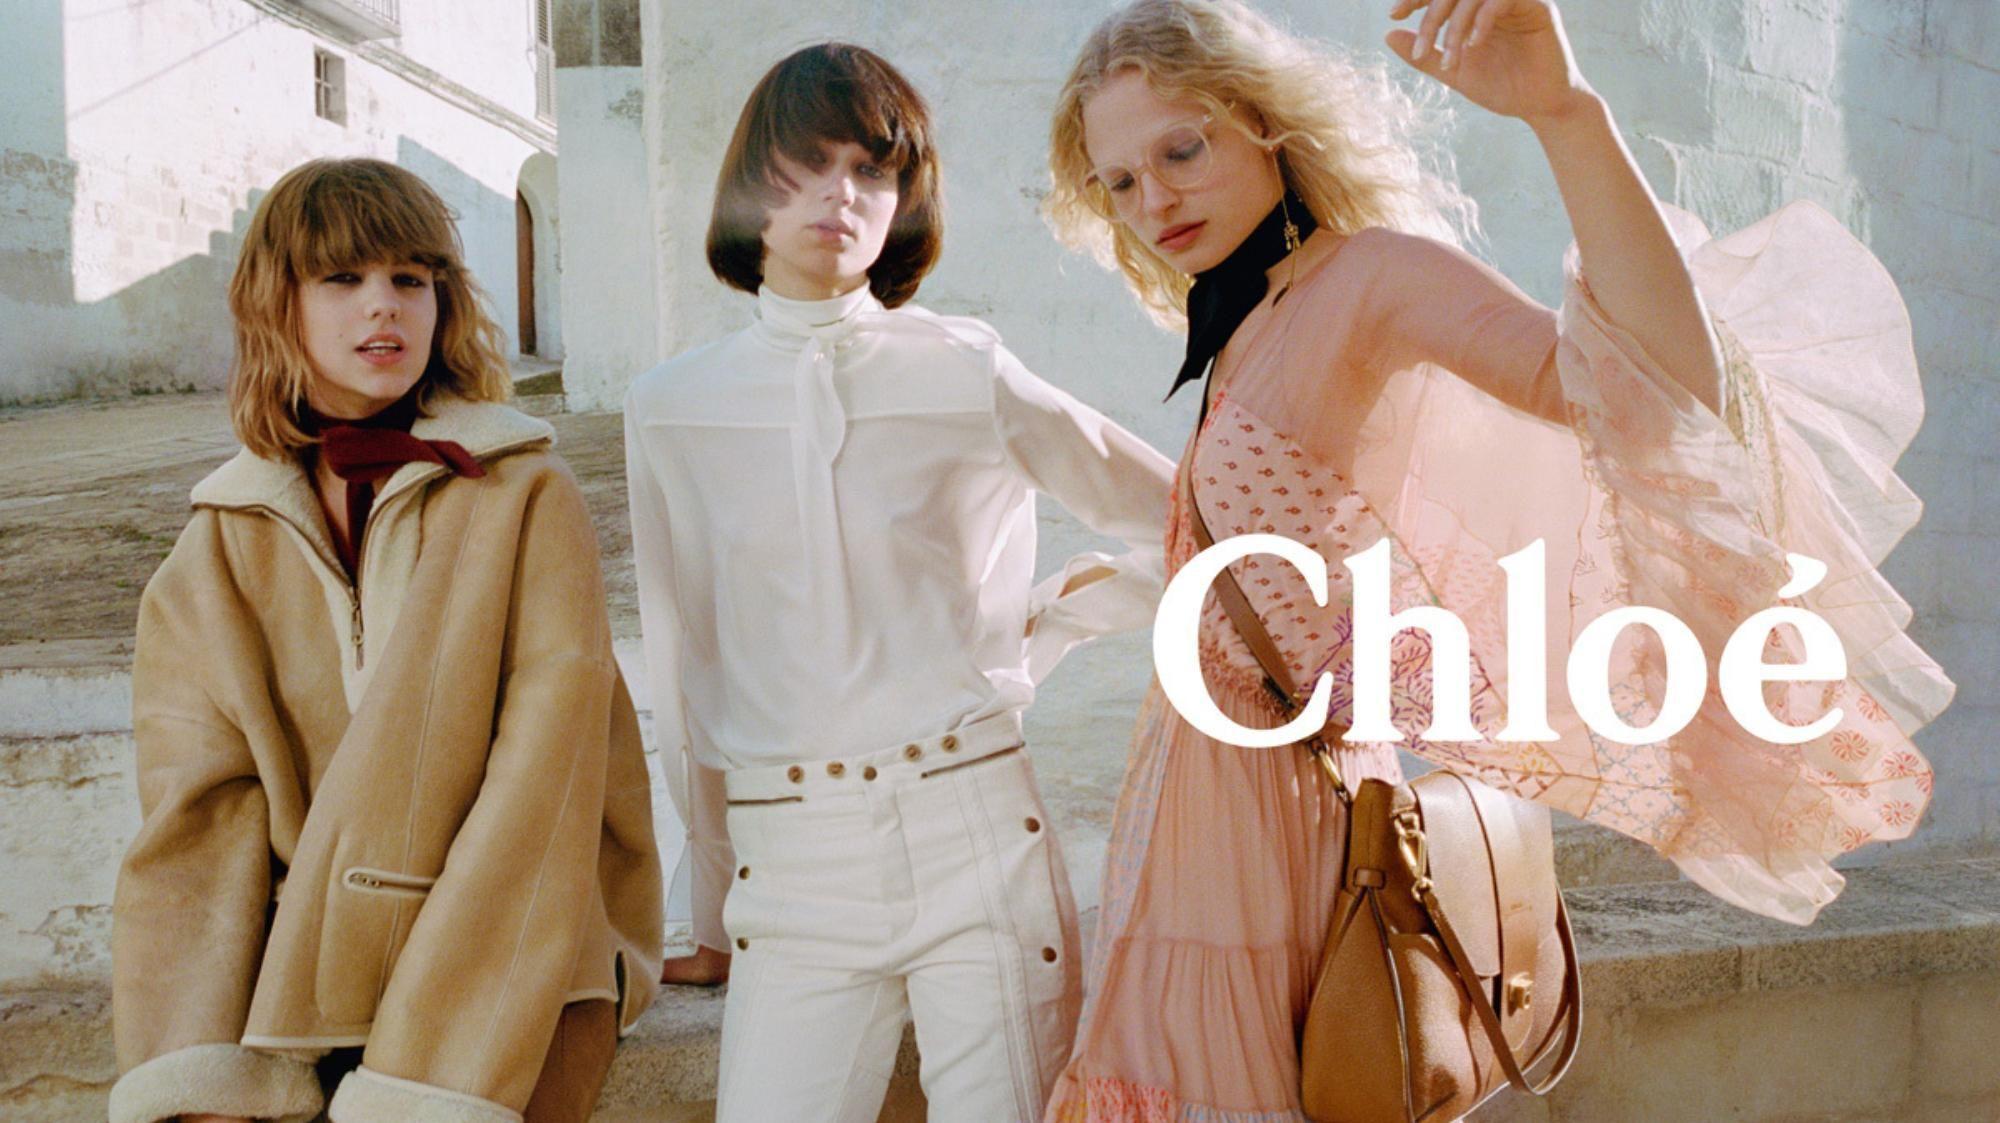 Frederikke Sofie Takes A Romantic Trip In Chloe S Autumn Winter 16 Campaign Chloe Fashion Campaign Fashion Editorial Fashion